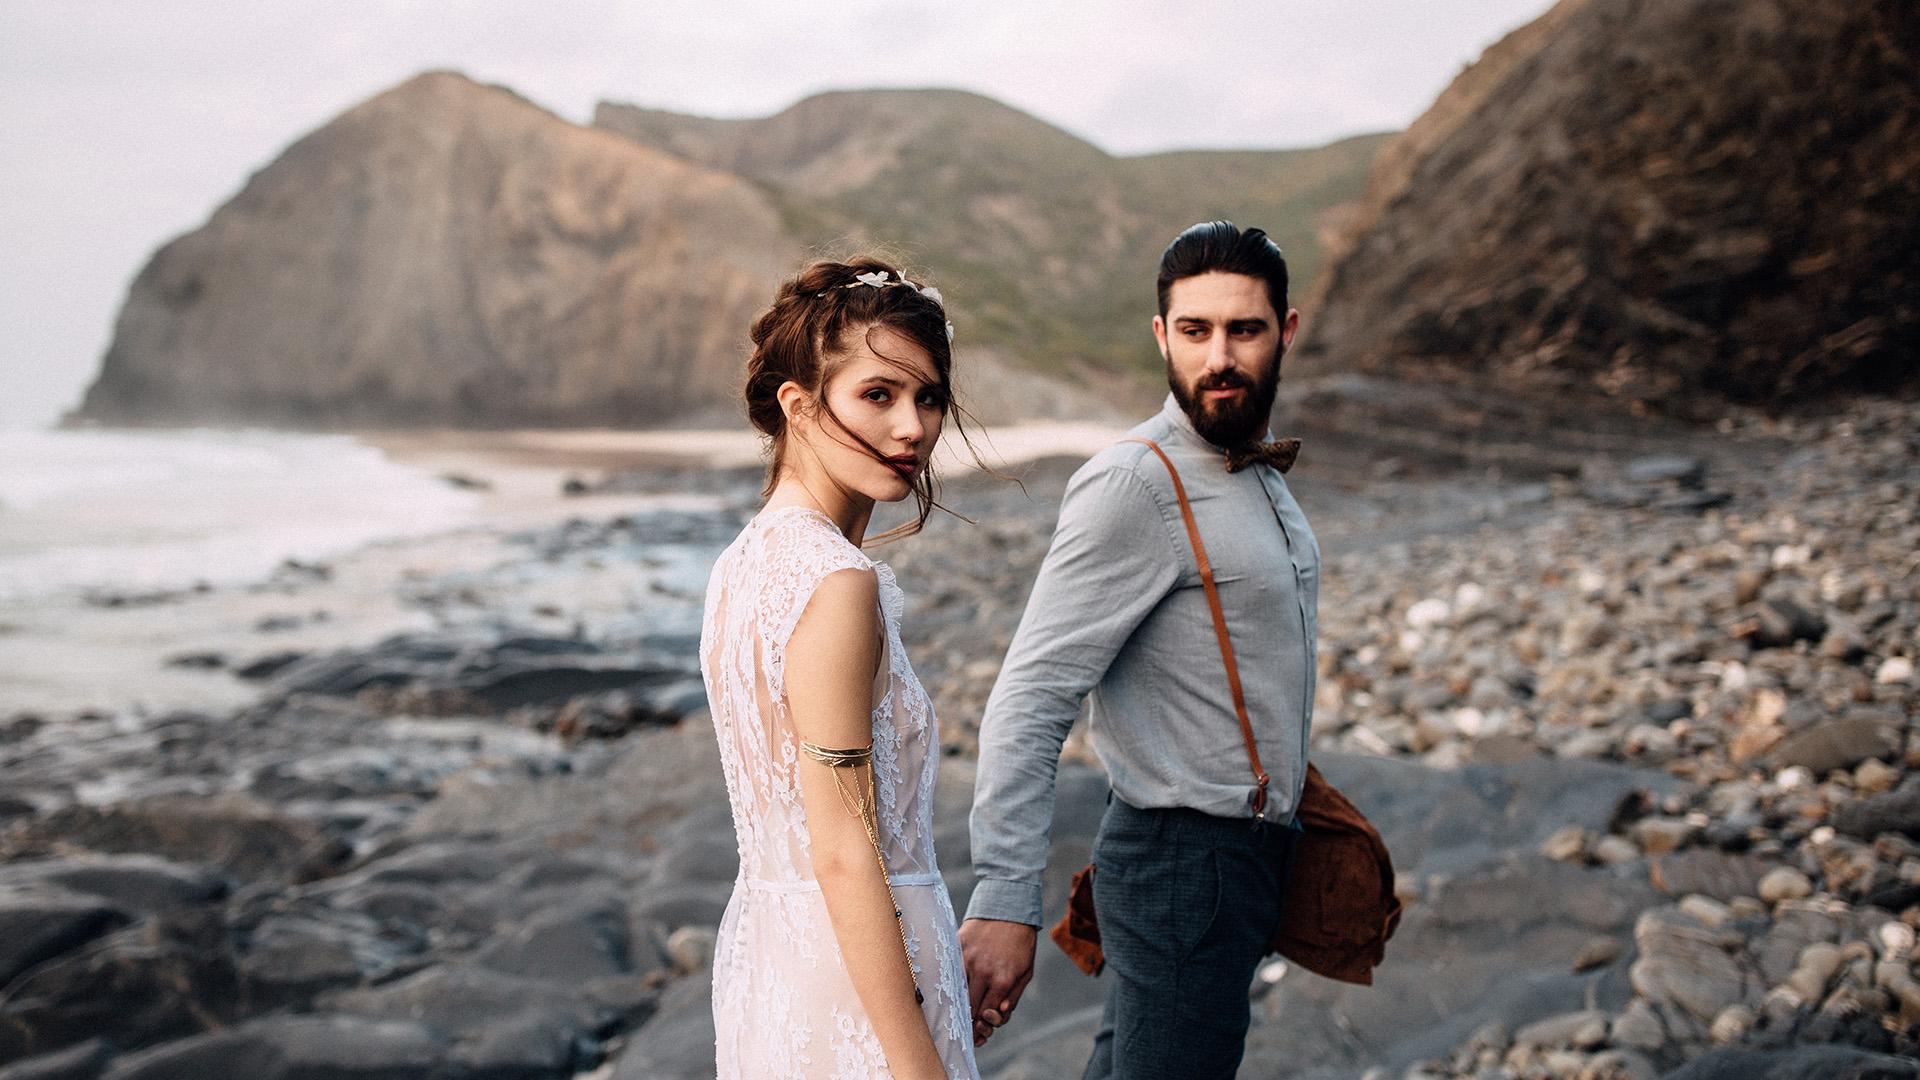 wedding photographer portugal algarve lisbon - Chris and ...